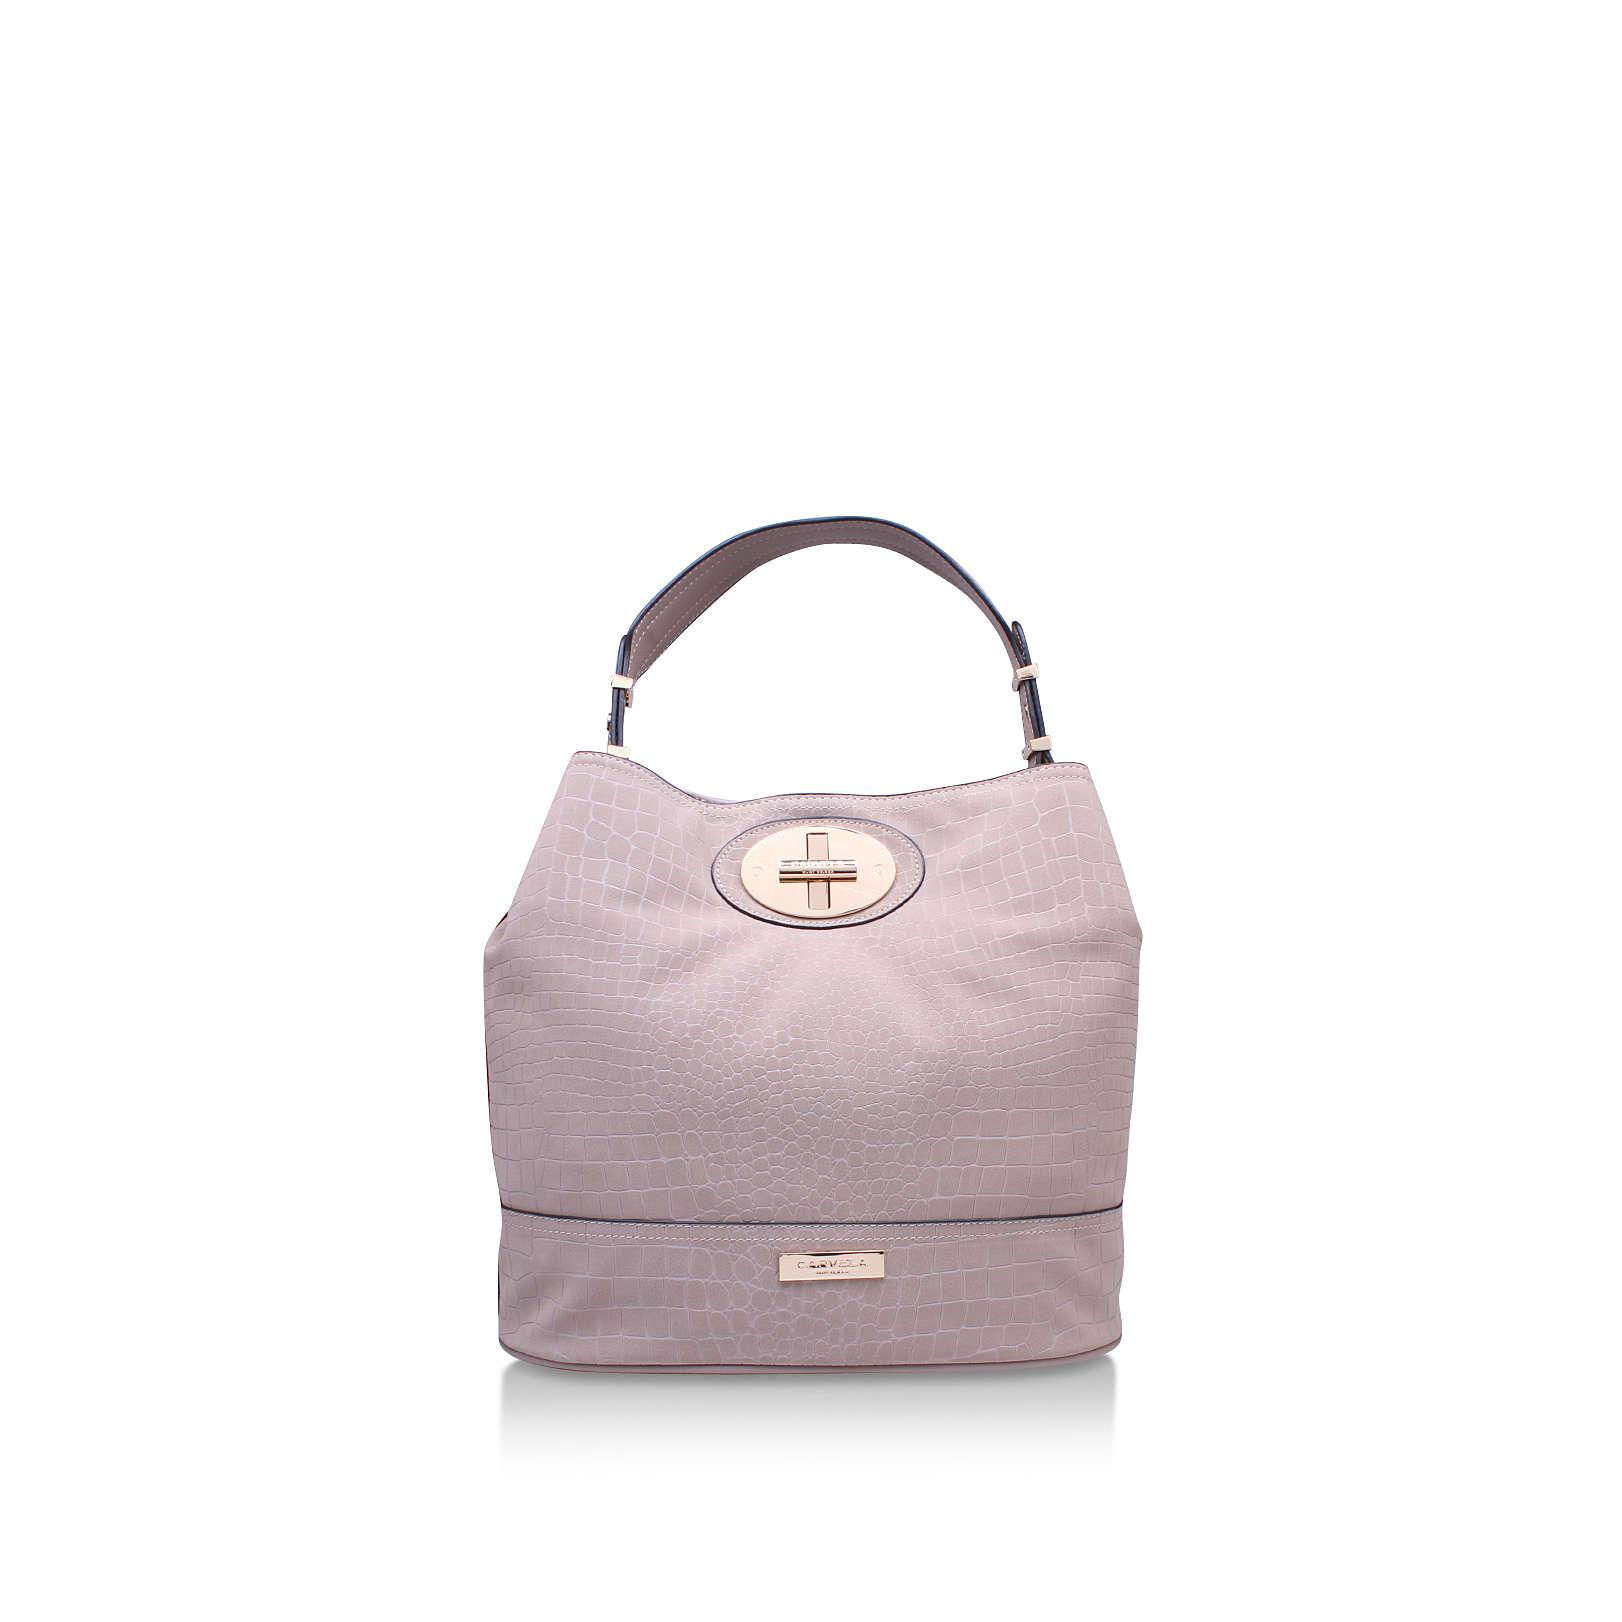 NADIA SLOUCH LOCK BAG